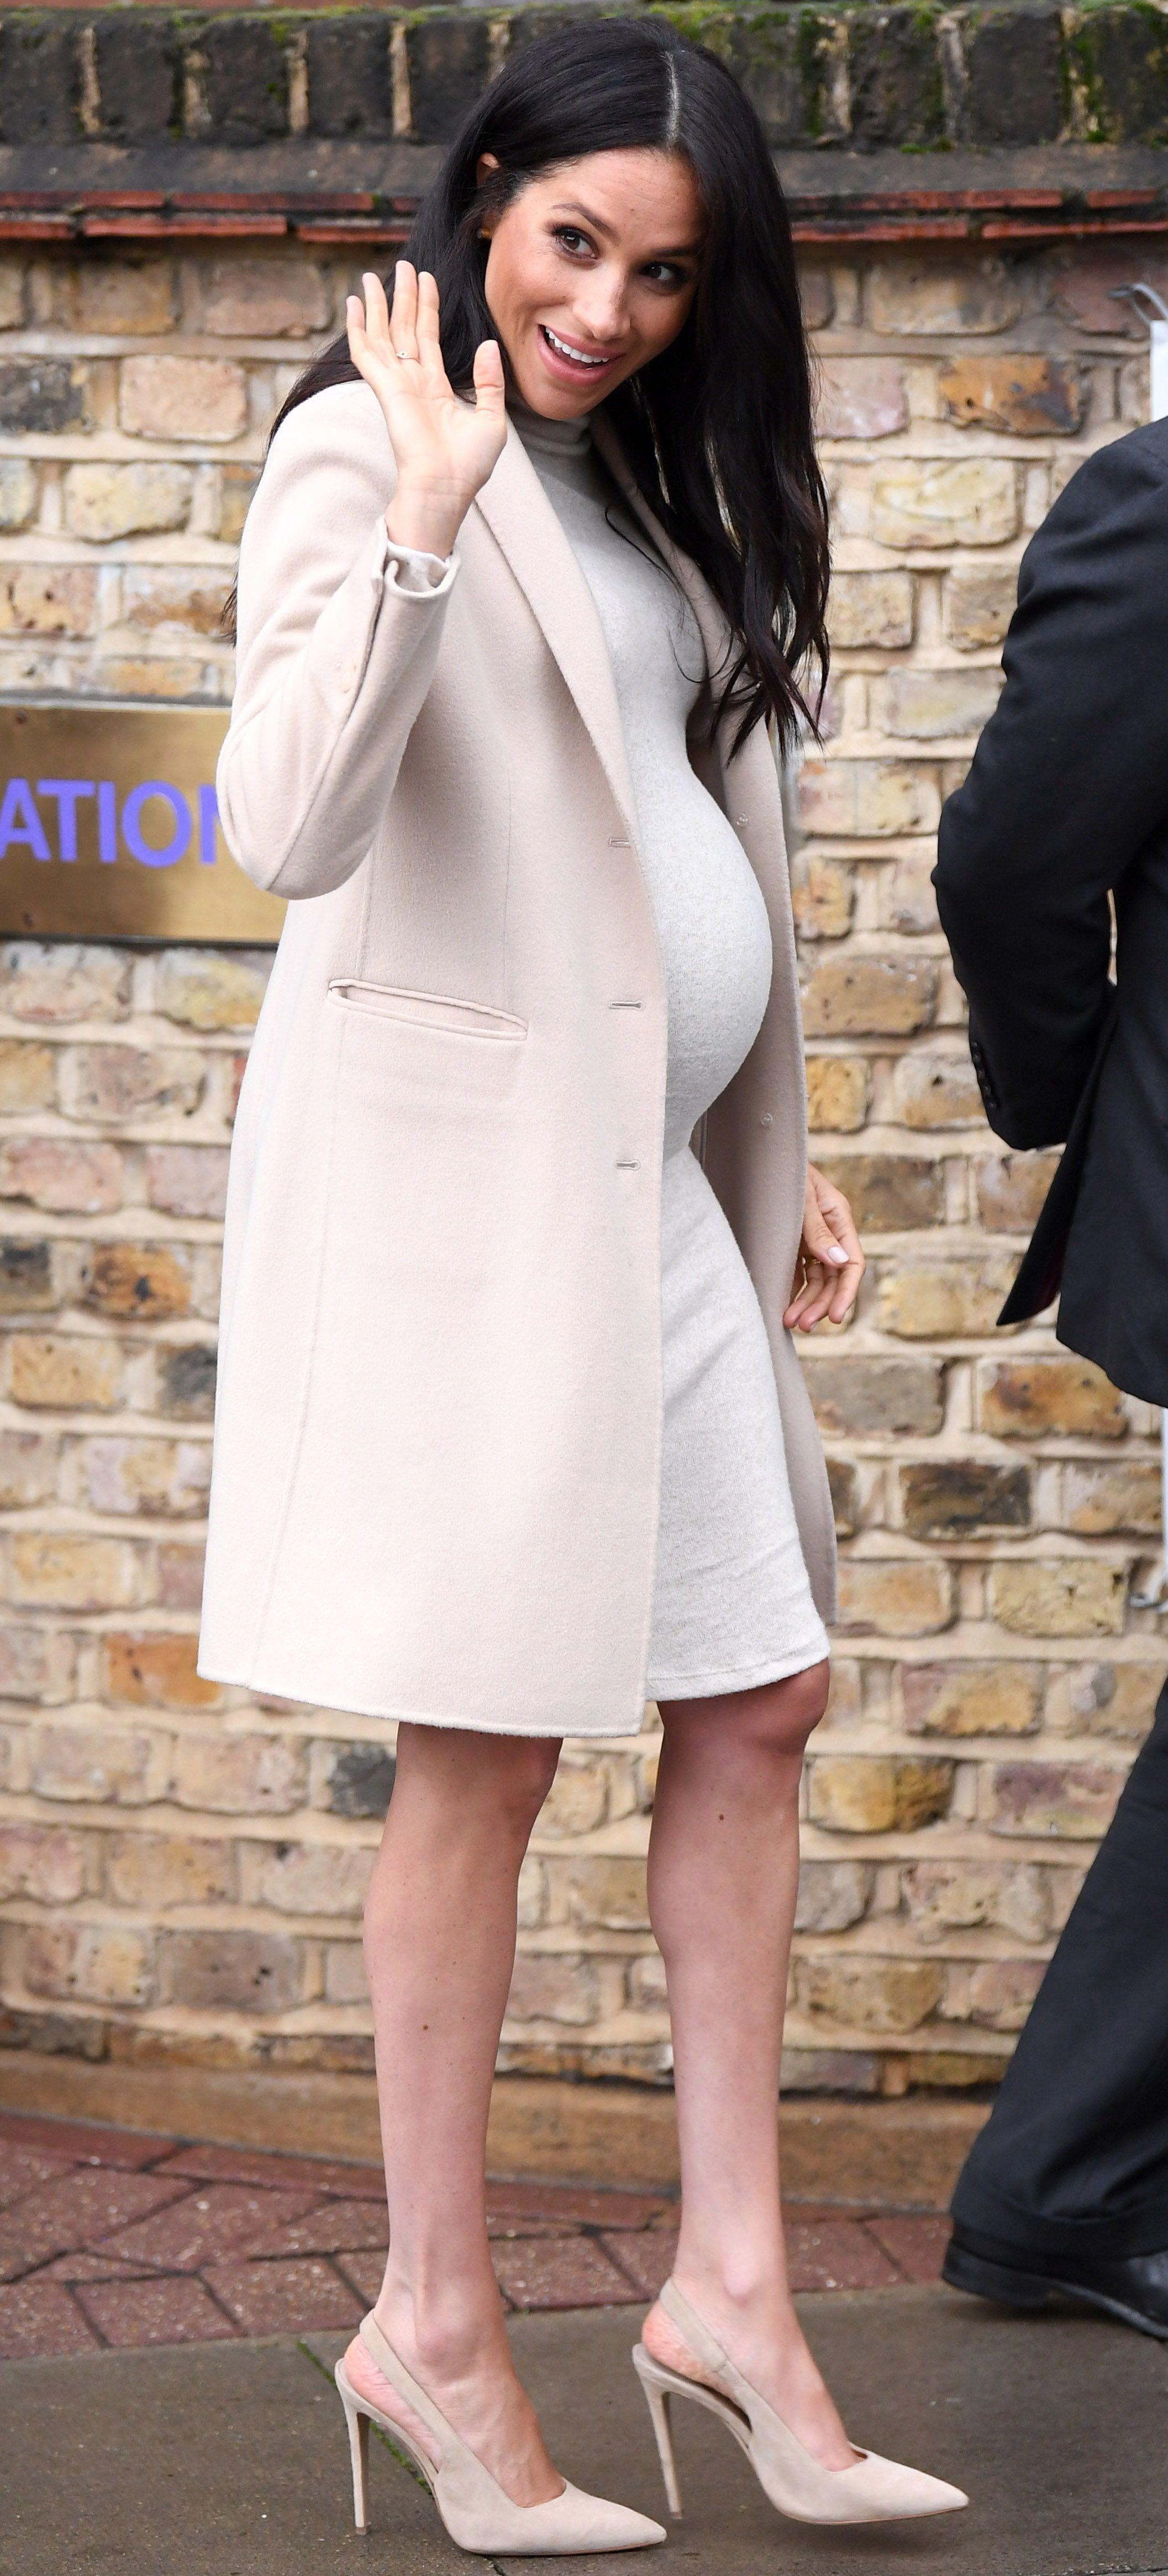 0dc5767e8db  MeghanMarkle wore a  35  HM maternity dress.  duchessofsussex  duchess   meghanmarklefashion  britishroyals